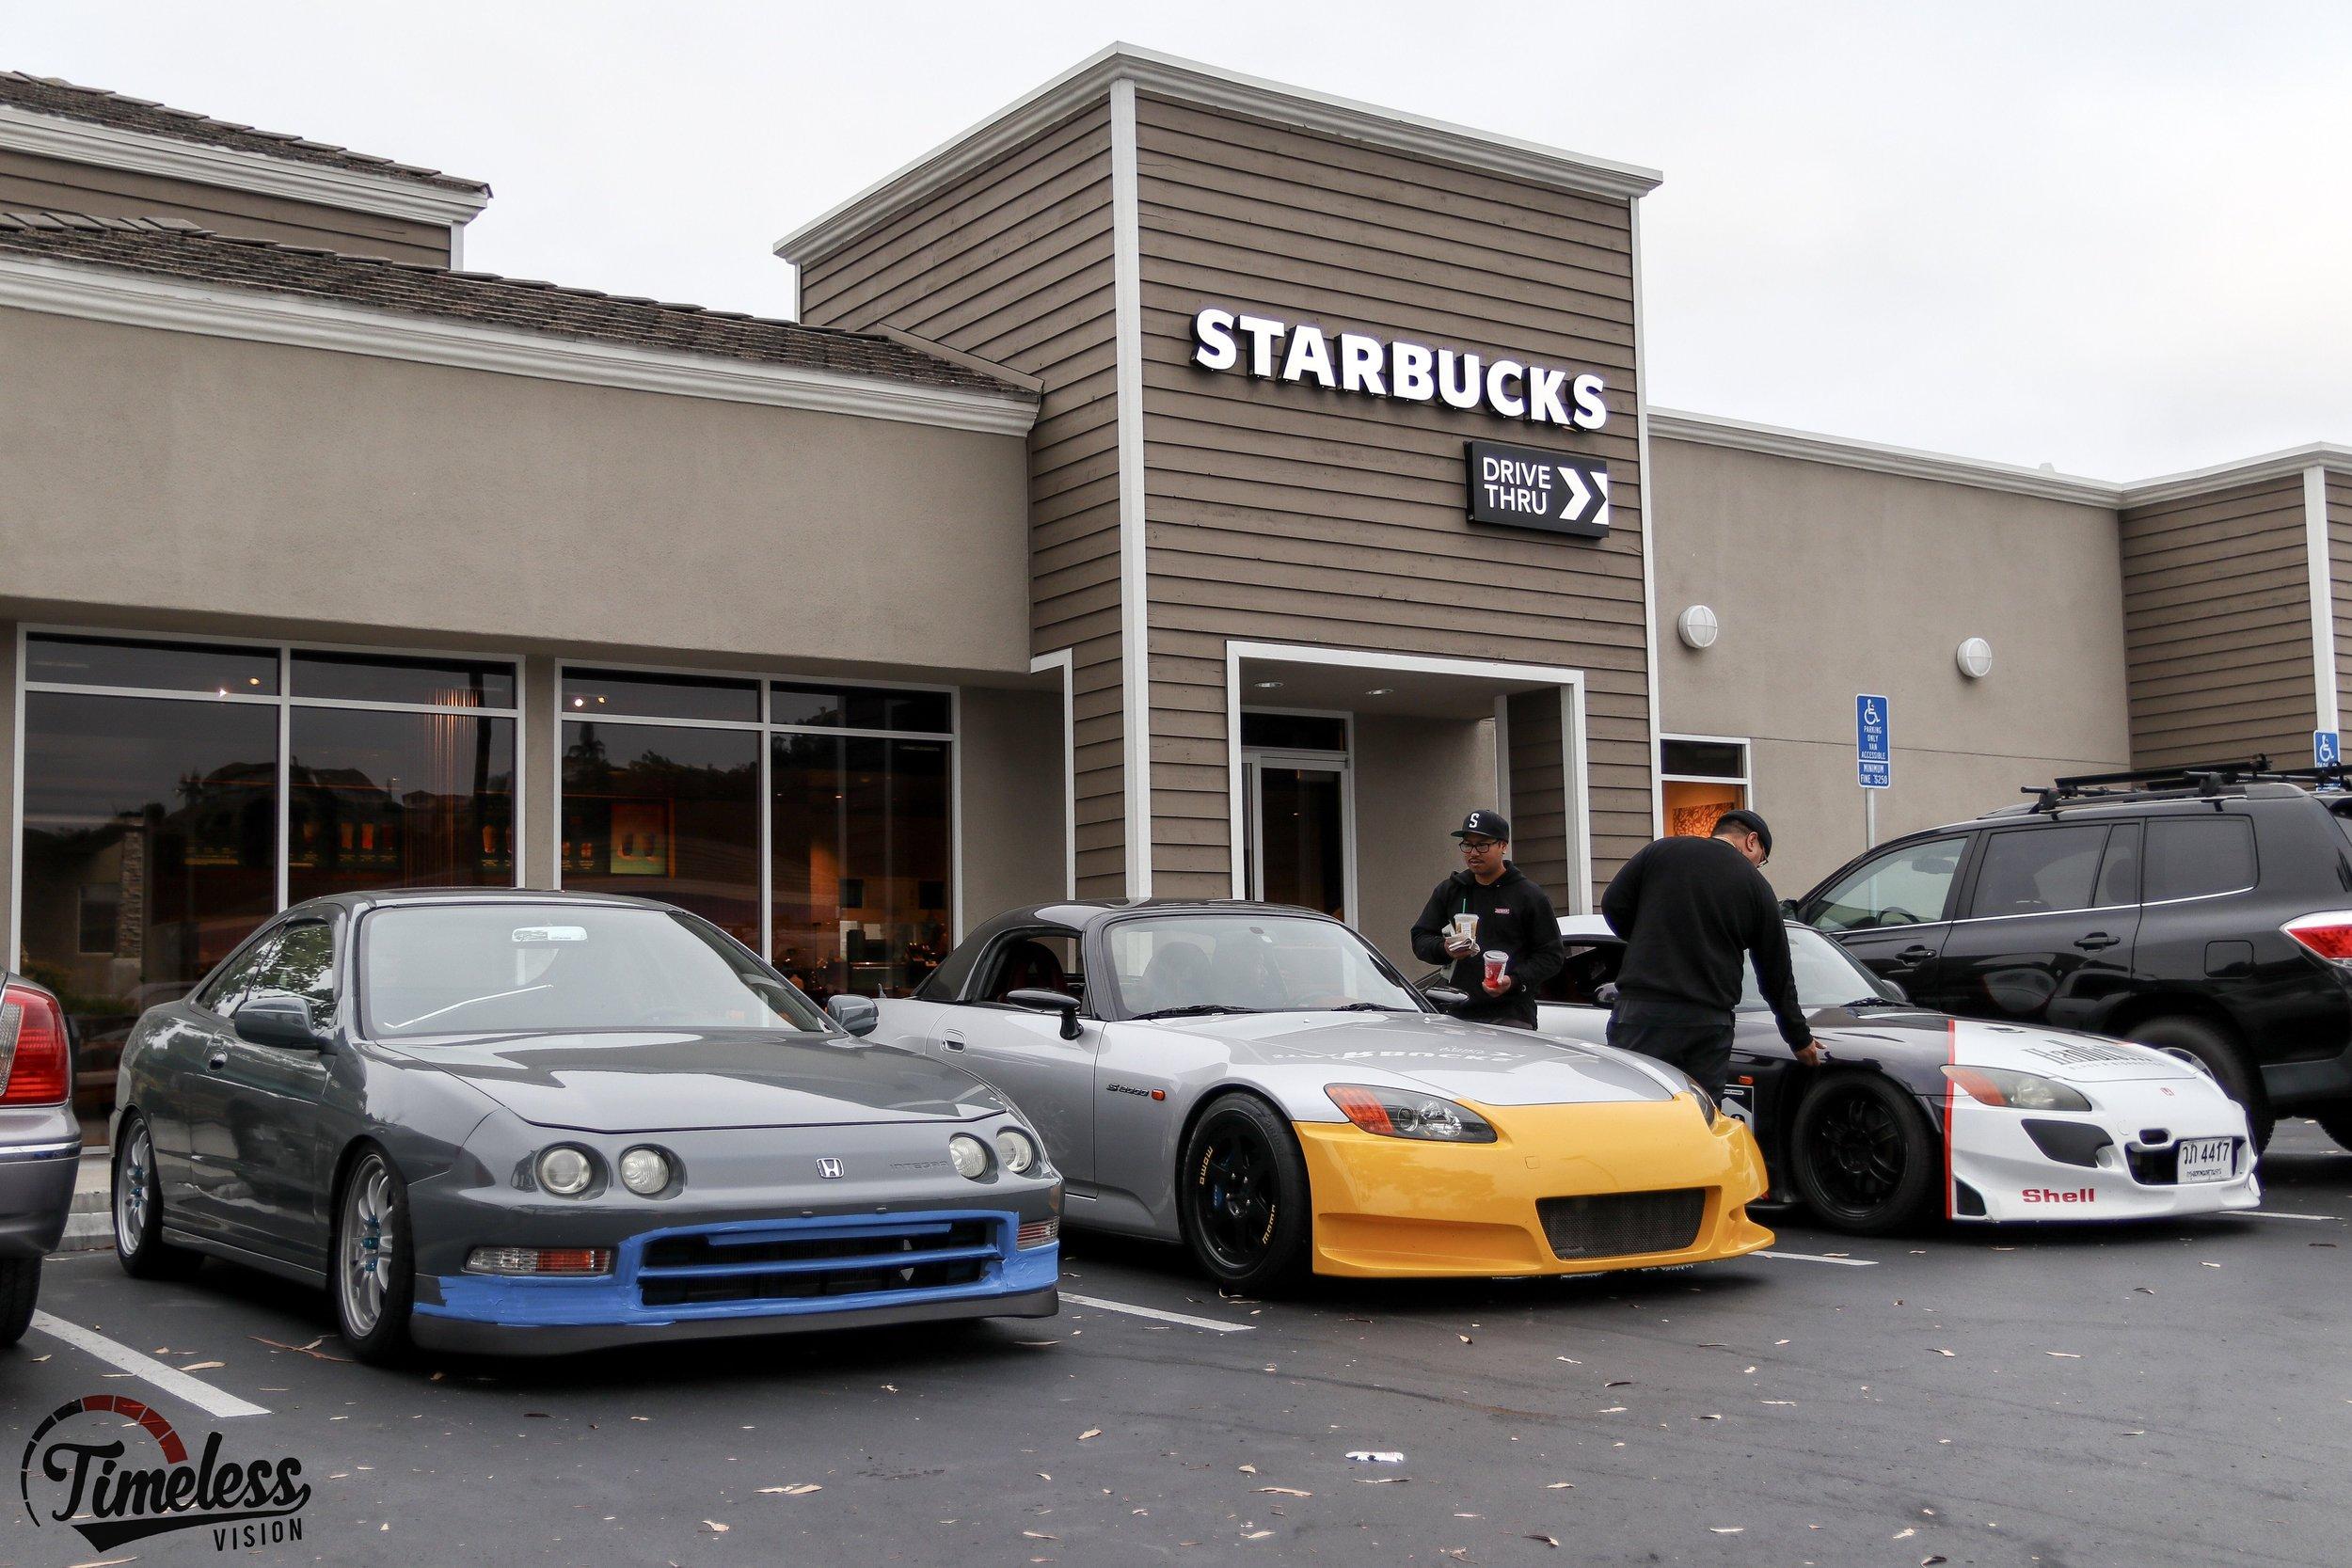 We met up at Starbucks on Scripps Poway.